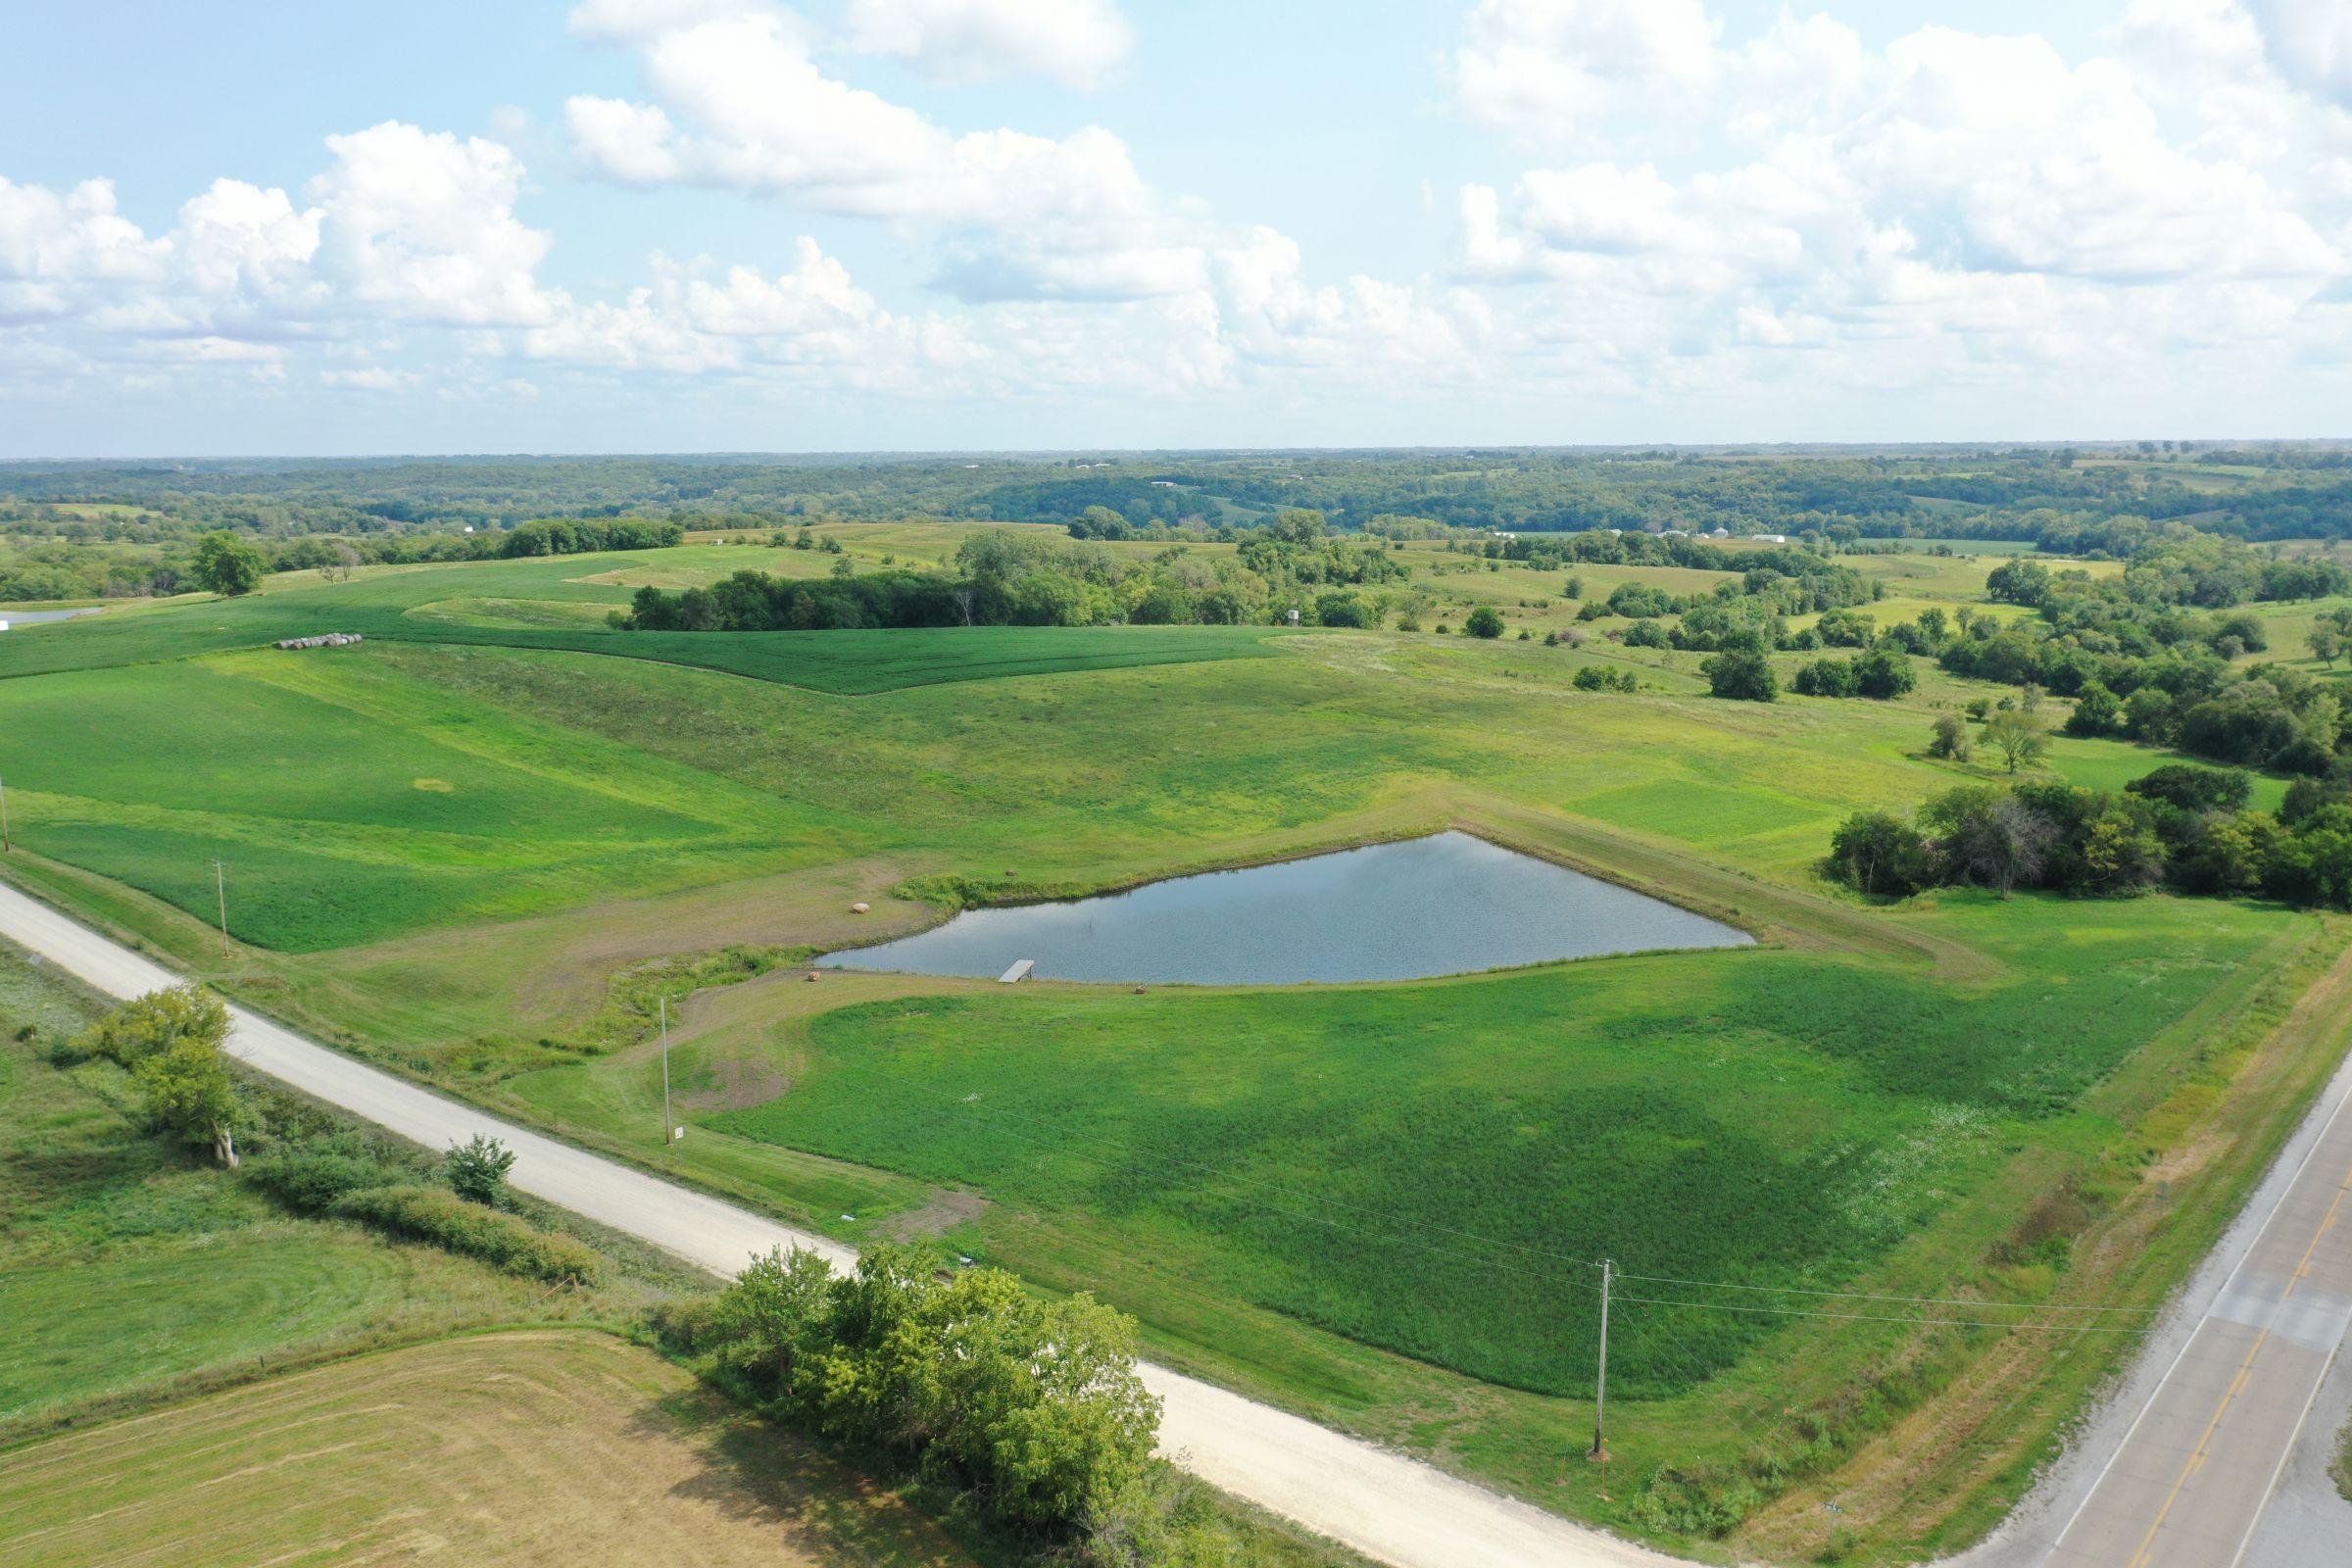 land-warren-county-iowa-9-acres-listing-number-15697-2-2021-08-24-224726.JPG